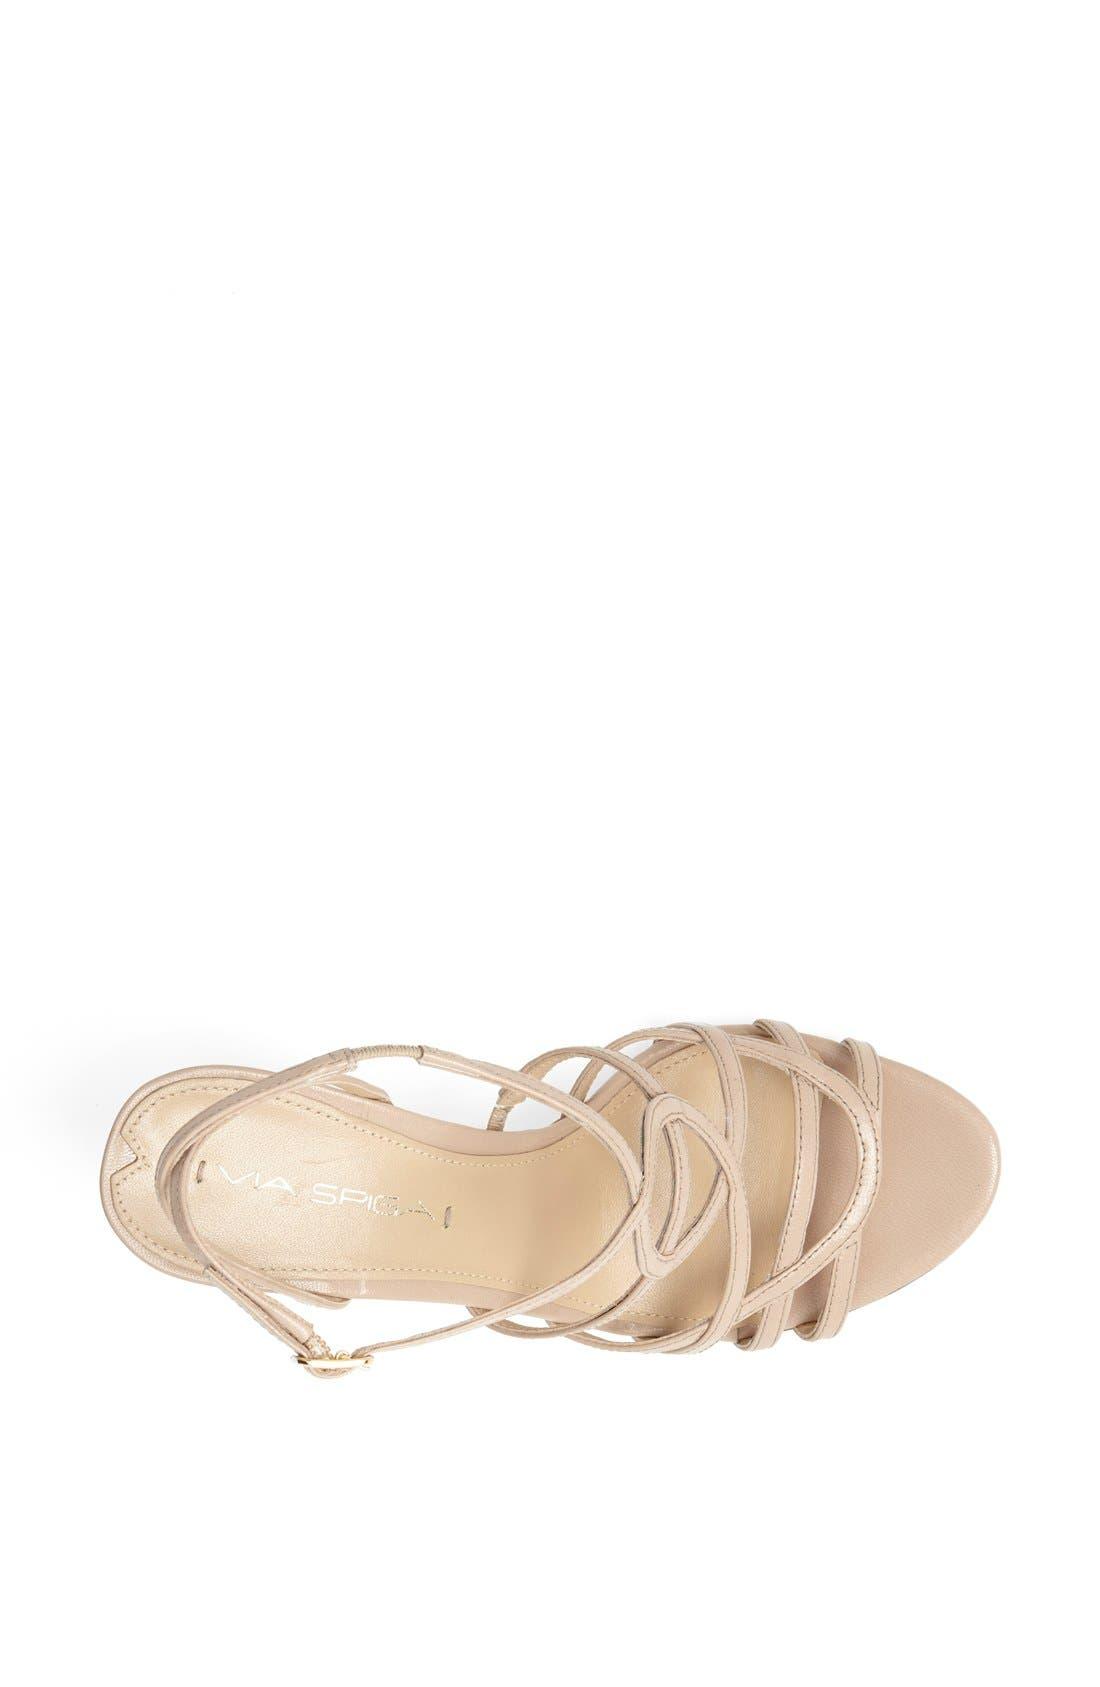 Alternate Image 3  - Via Spiga 'Ima' Sandal (Nordstrom Exclusive)